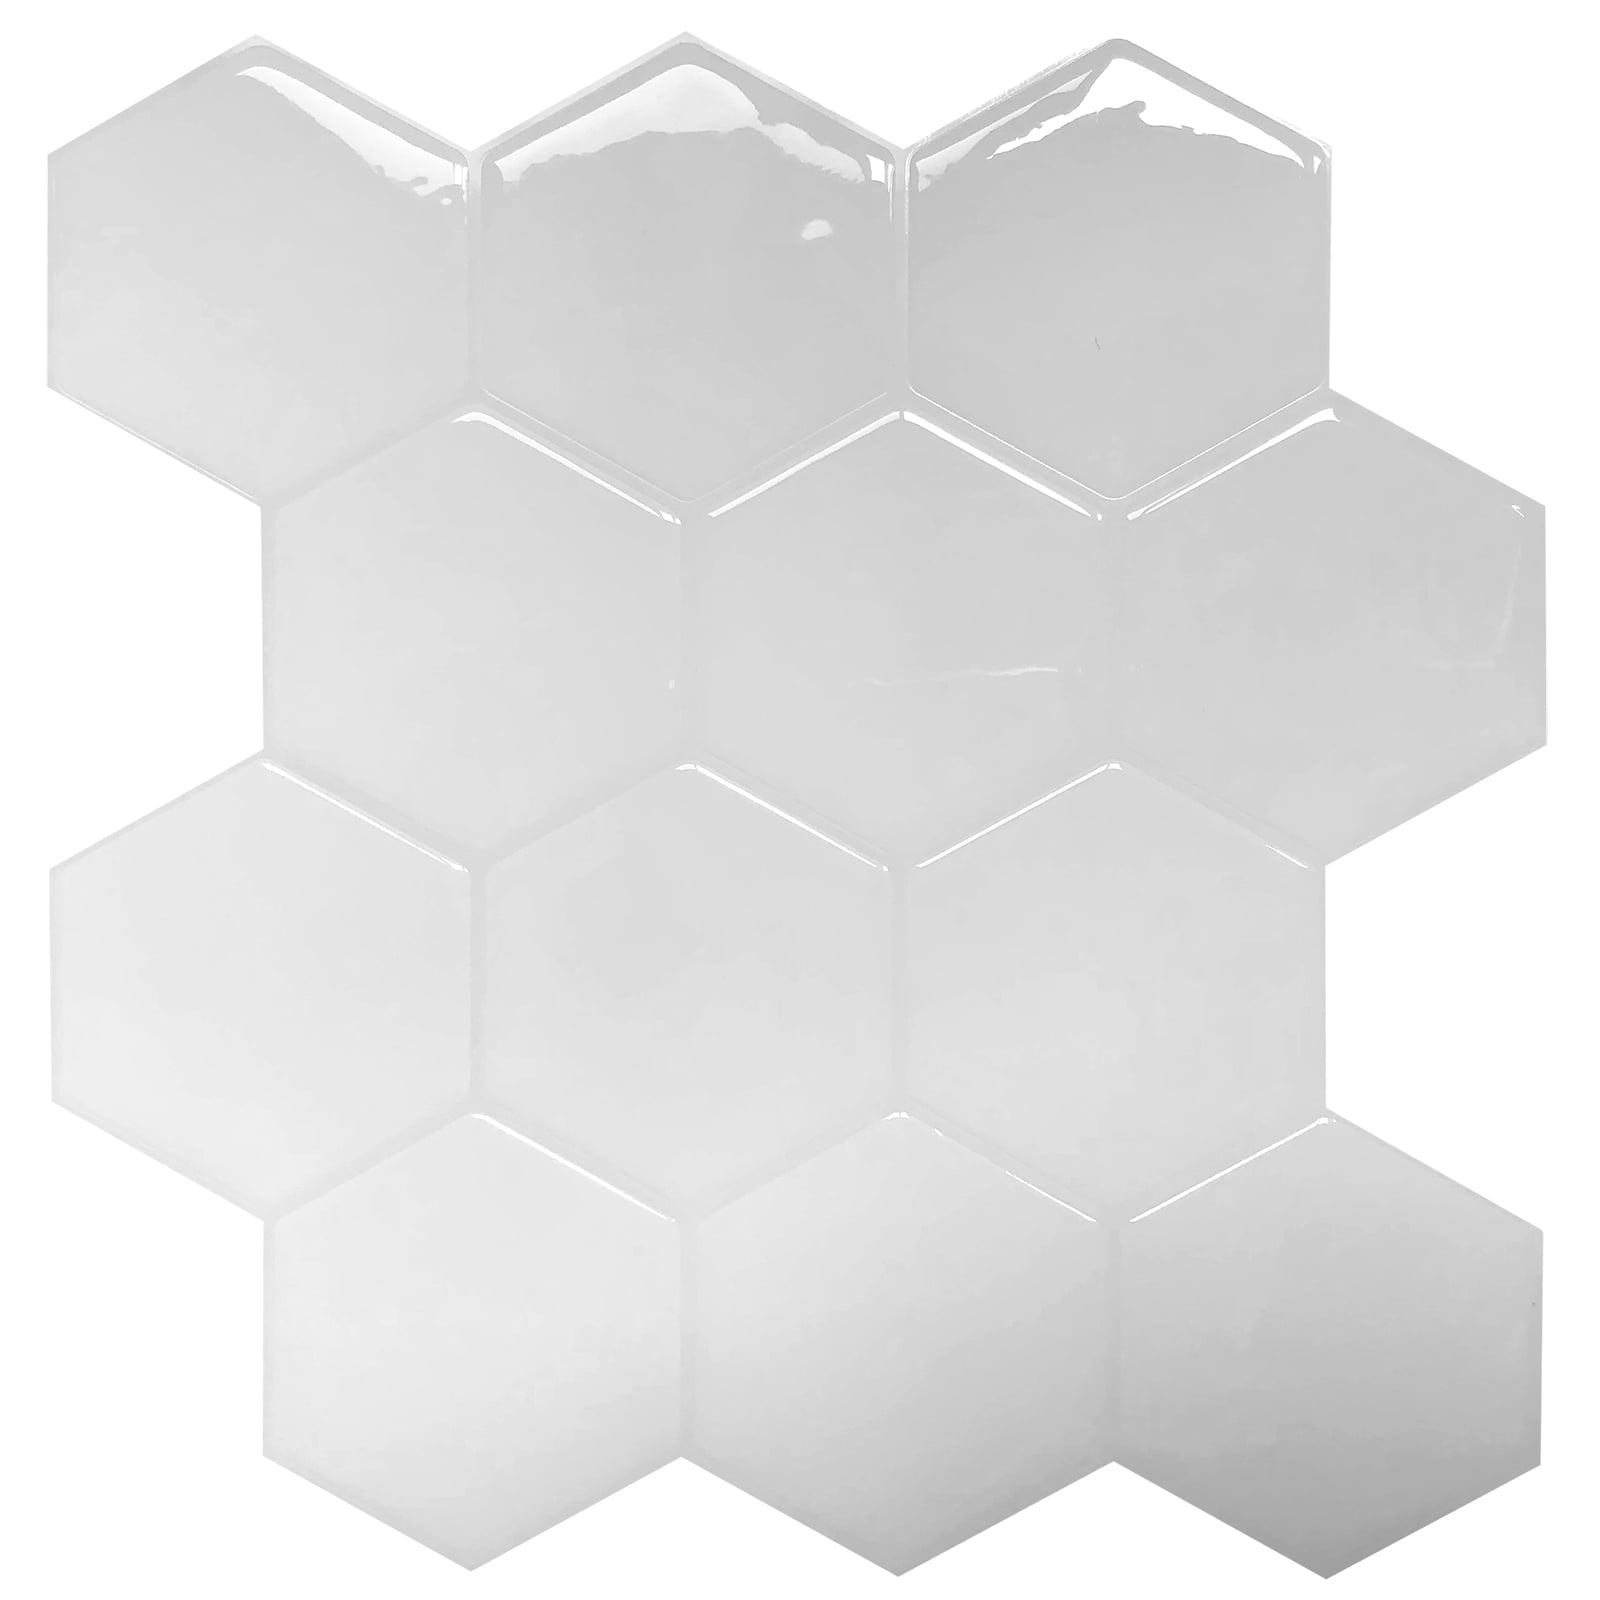 - 10 Sheets Peel And Stick Backsplash Tiles Self-adhesive Decorative Tiles -  Walmart.com - Walmart.com